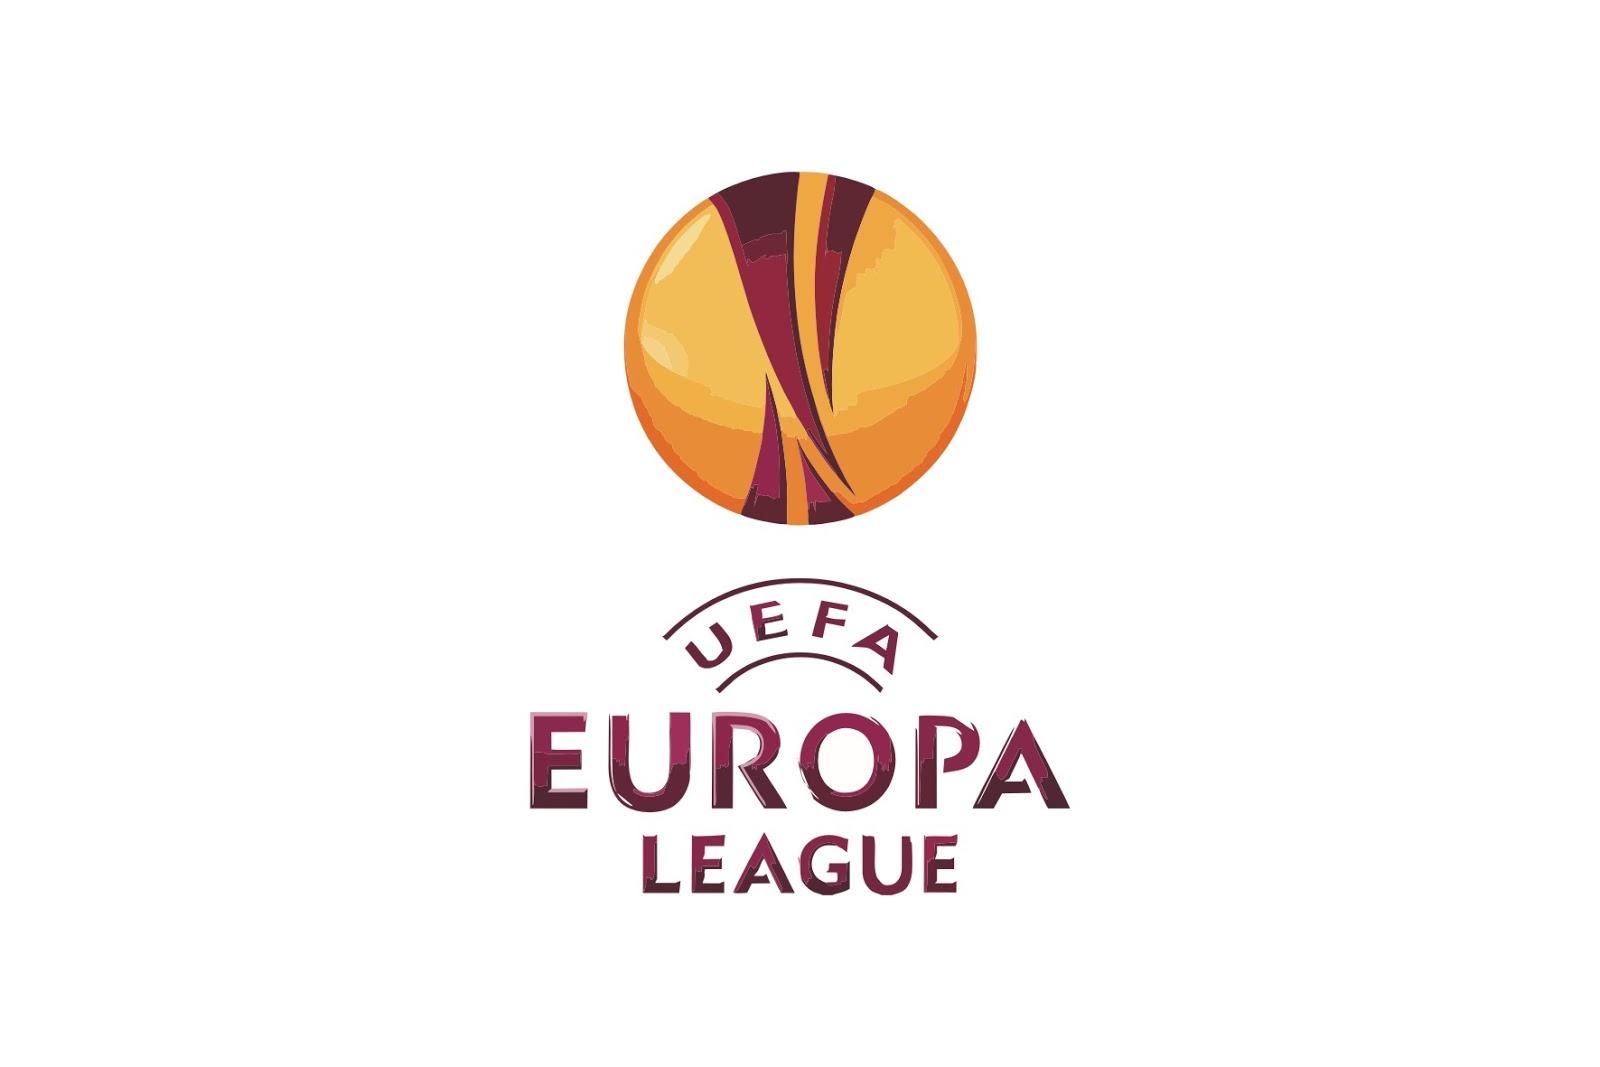 europa league - photo #1